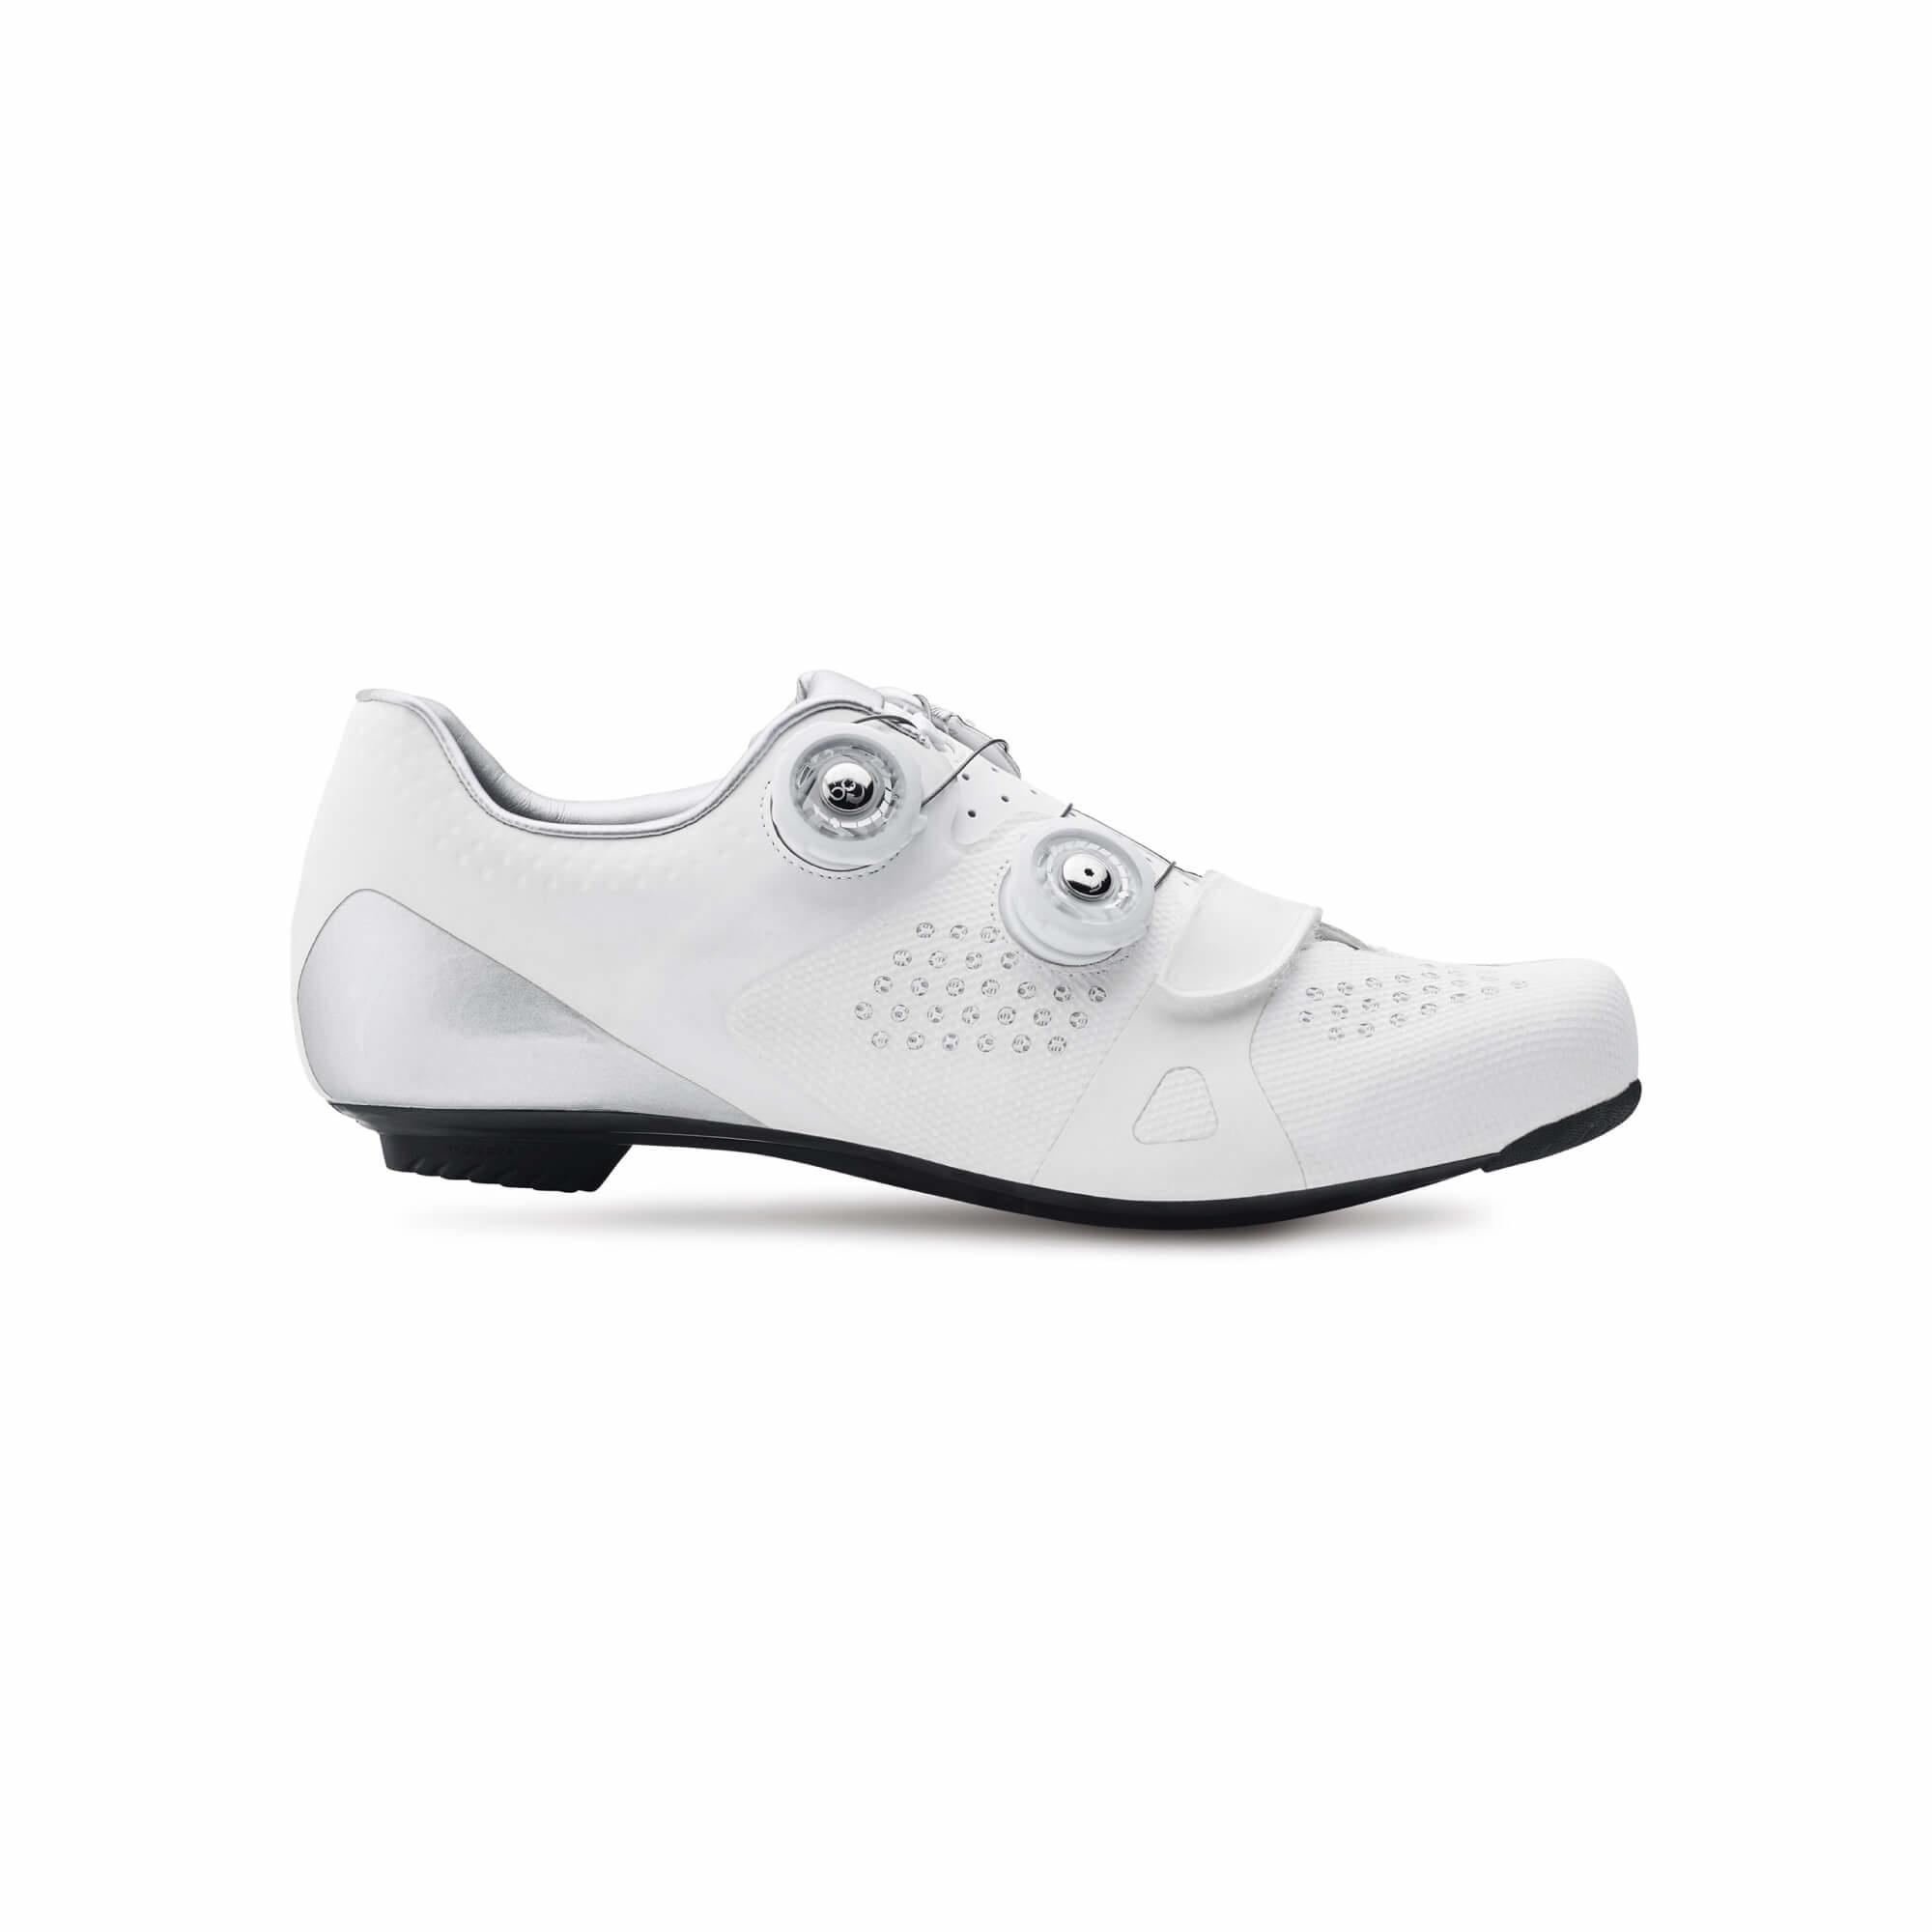 Torch 3.0 Road Shoe Women-1